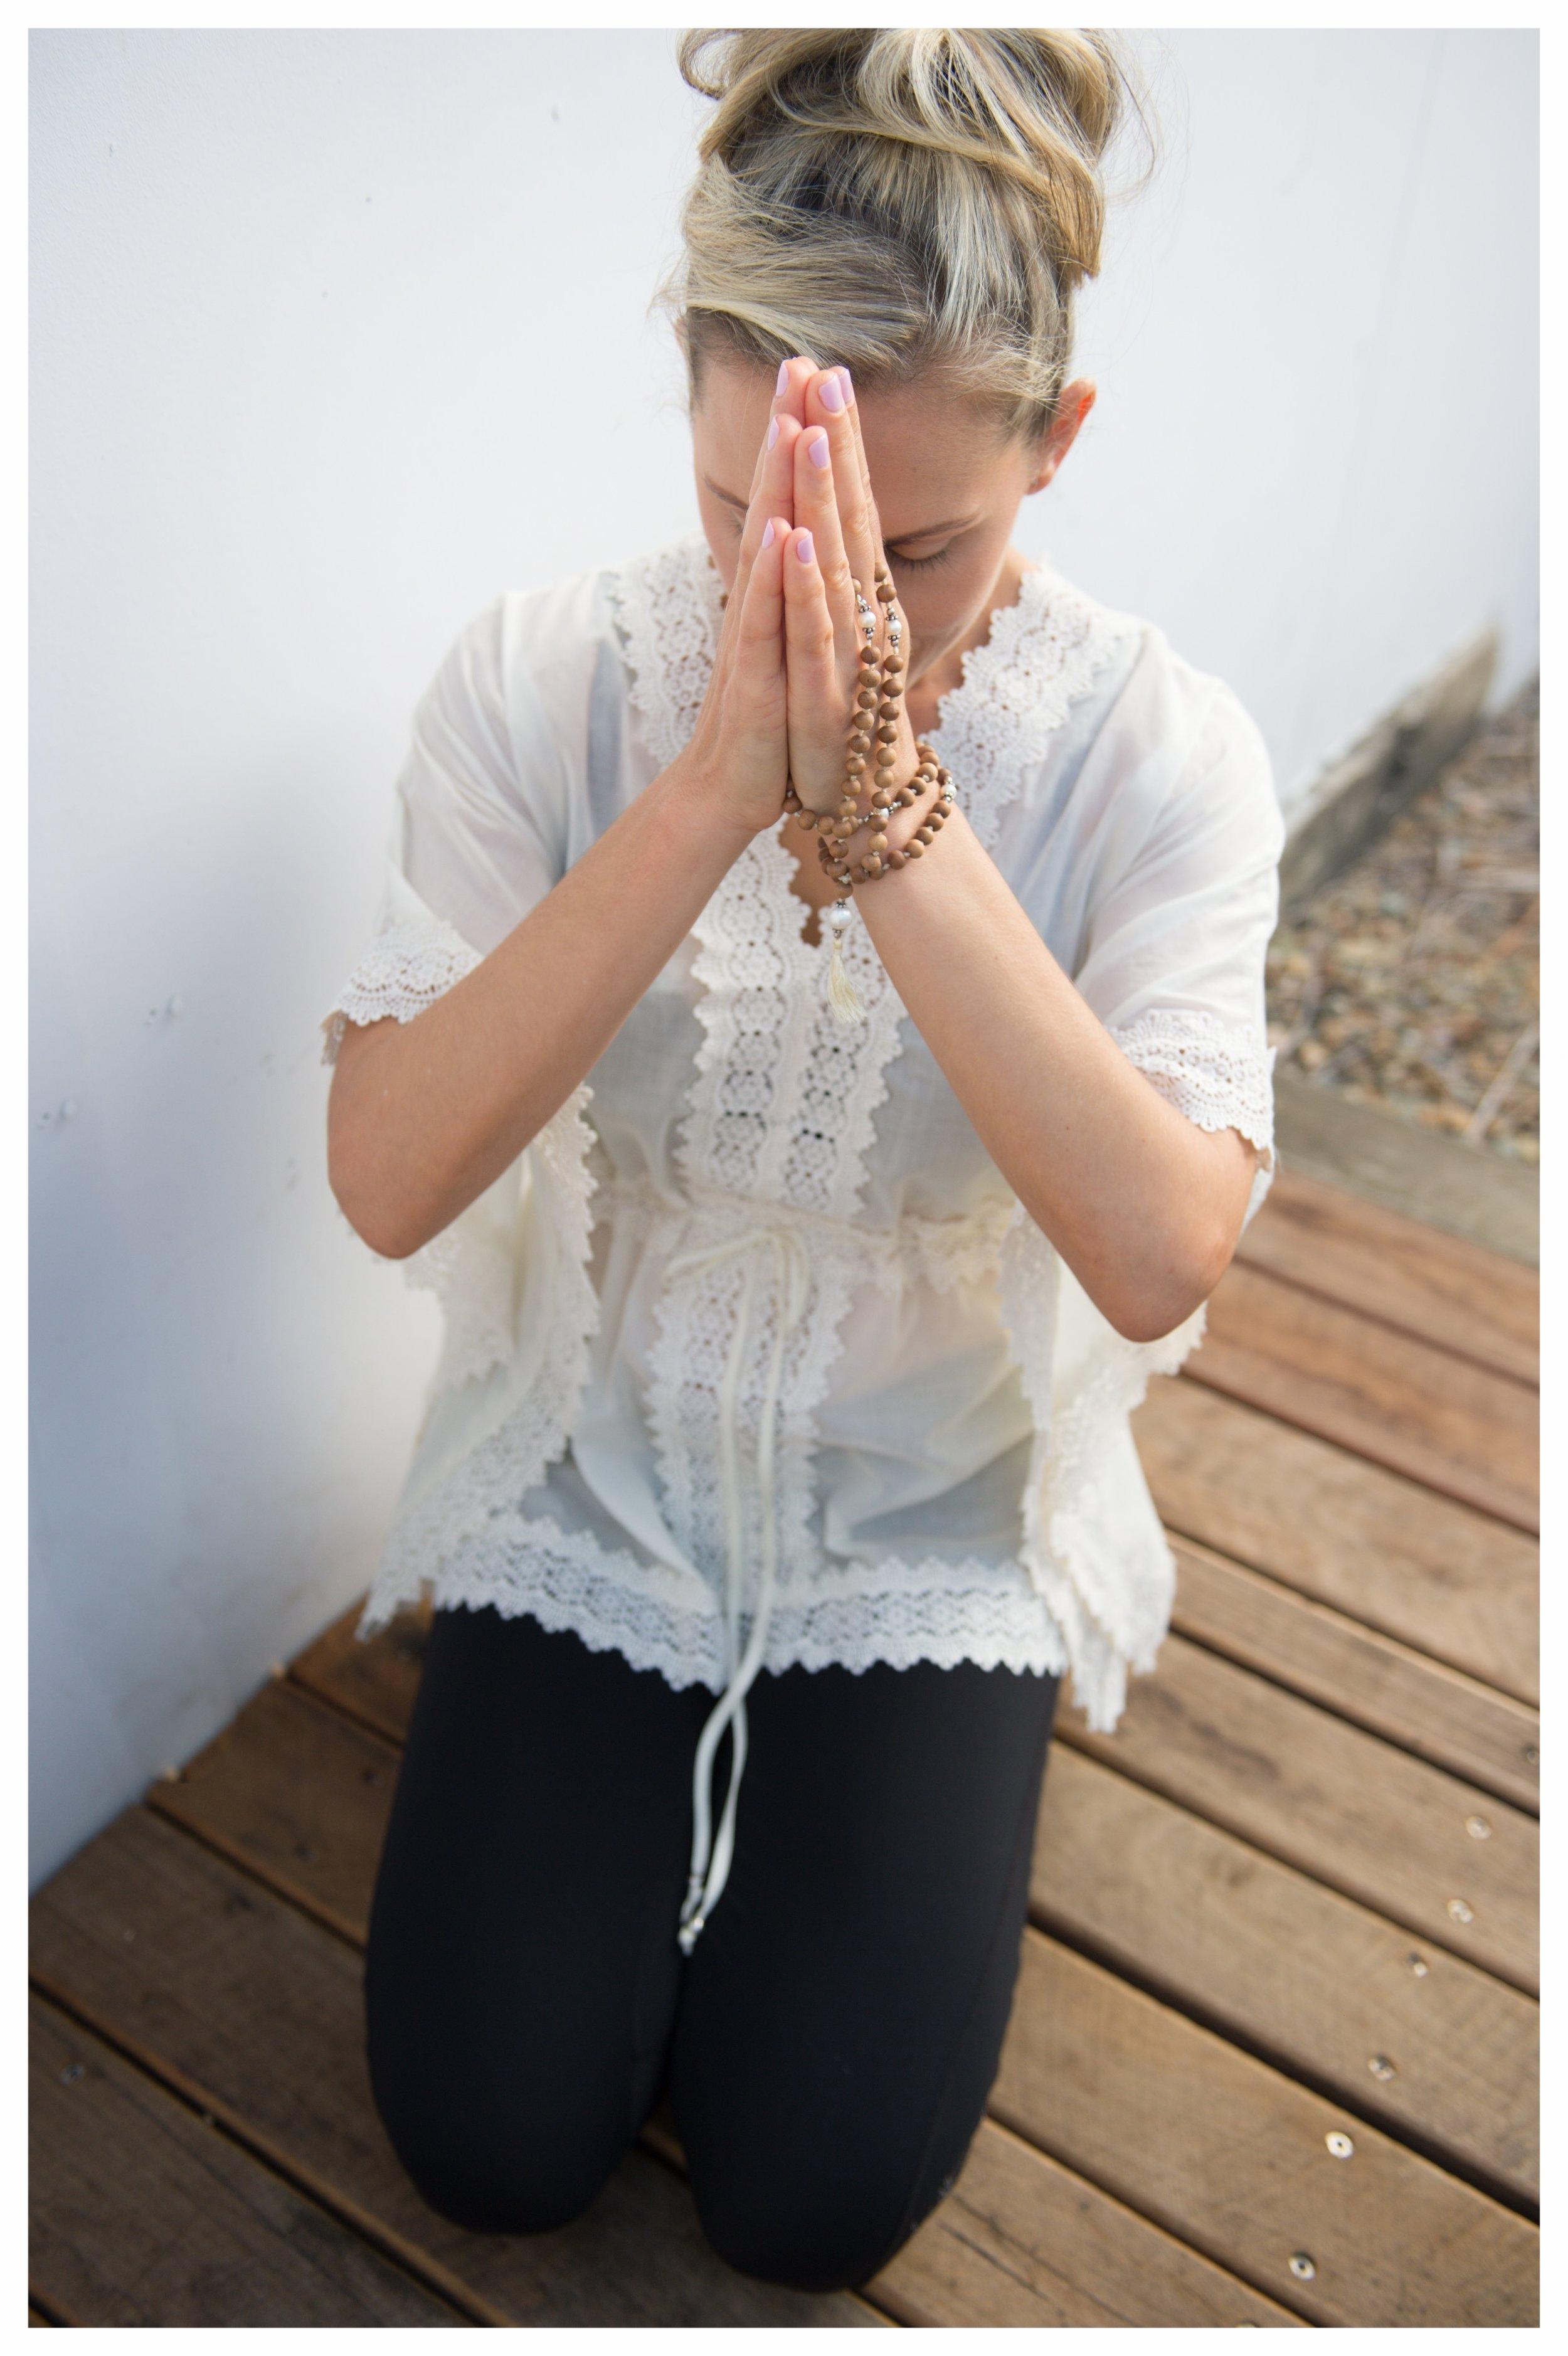 yogashootprintreadyfiles018.jpg